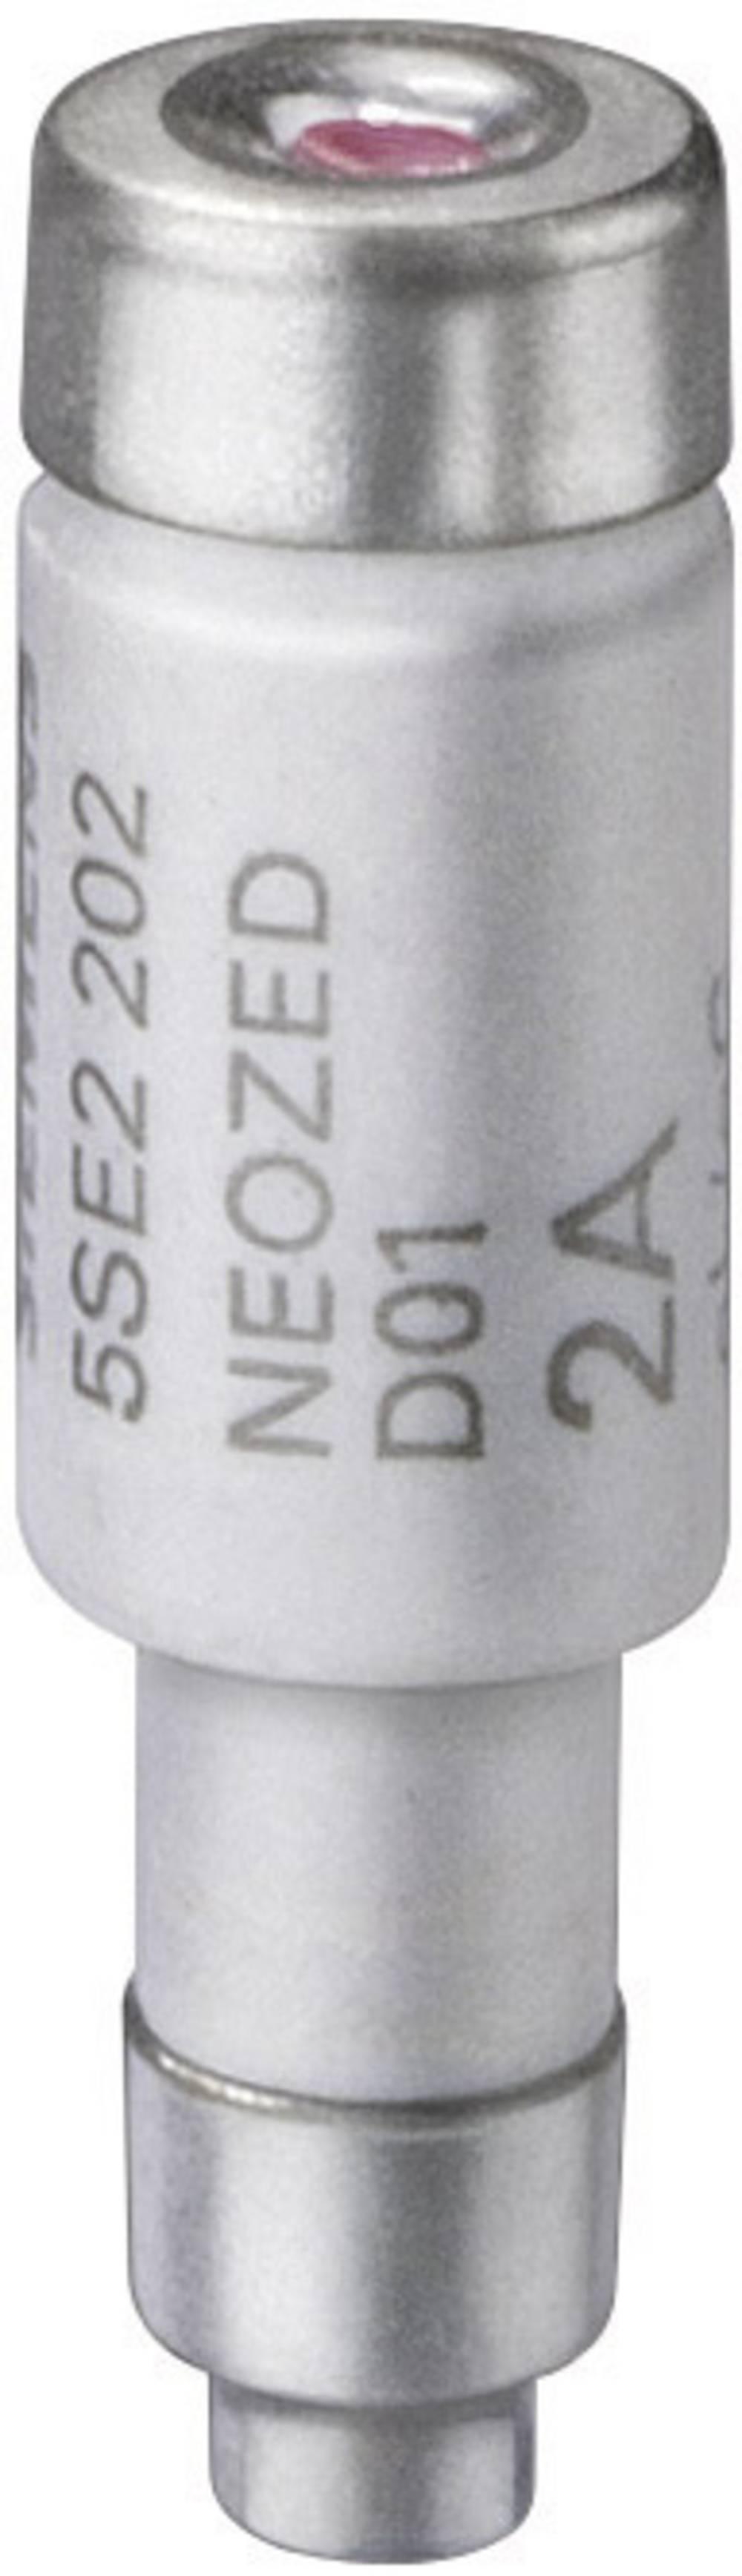 Varovalka Neozed, velikost varovalke = D02 20 A Siemens 5SE2320